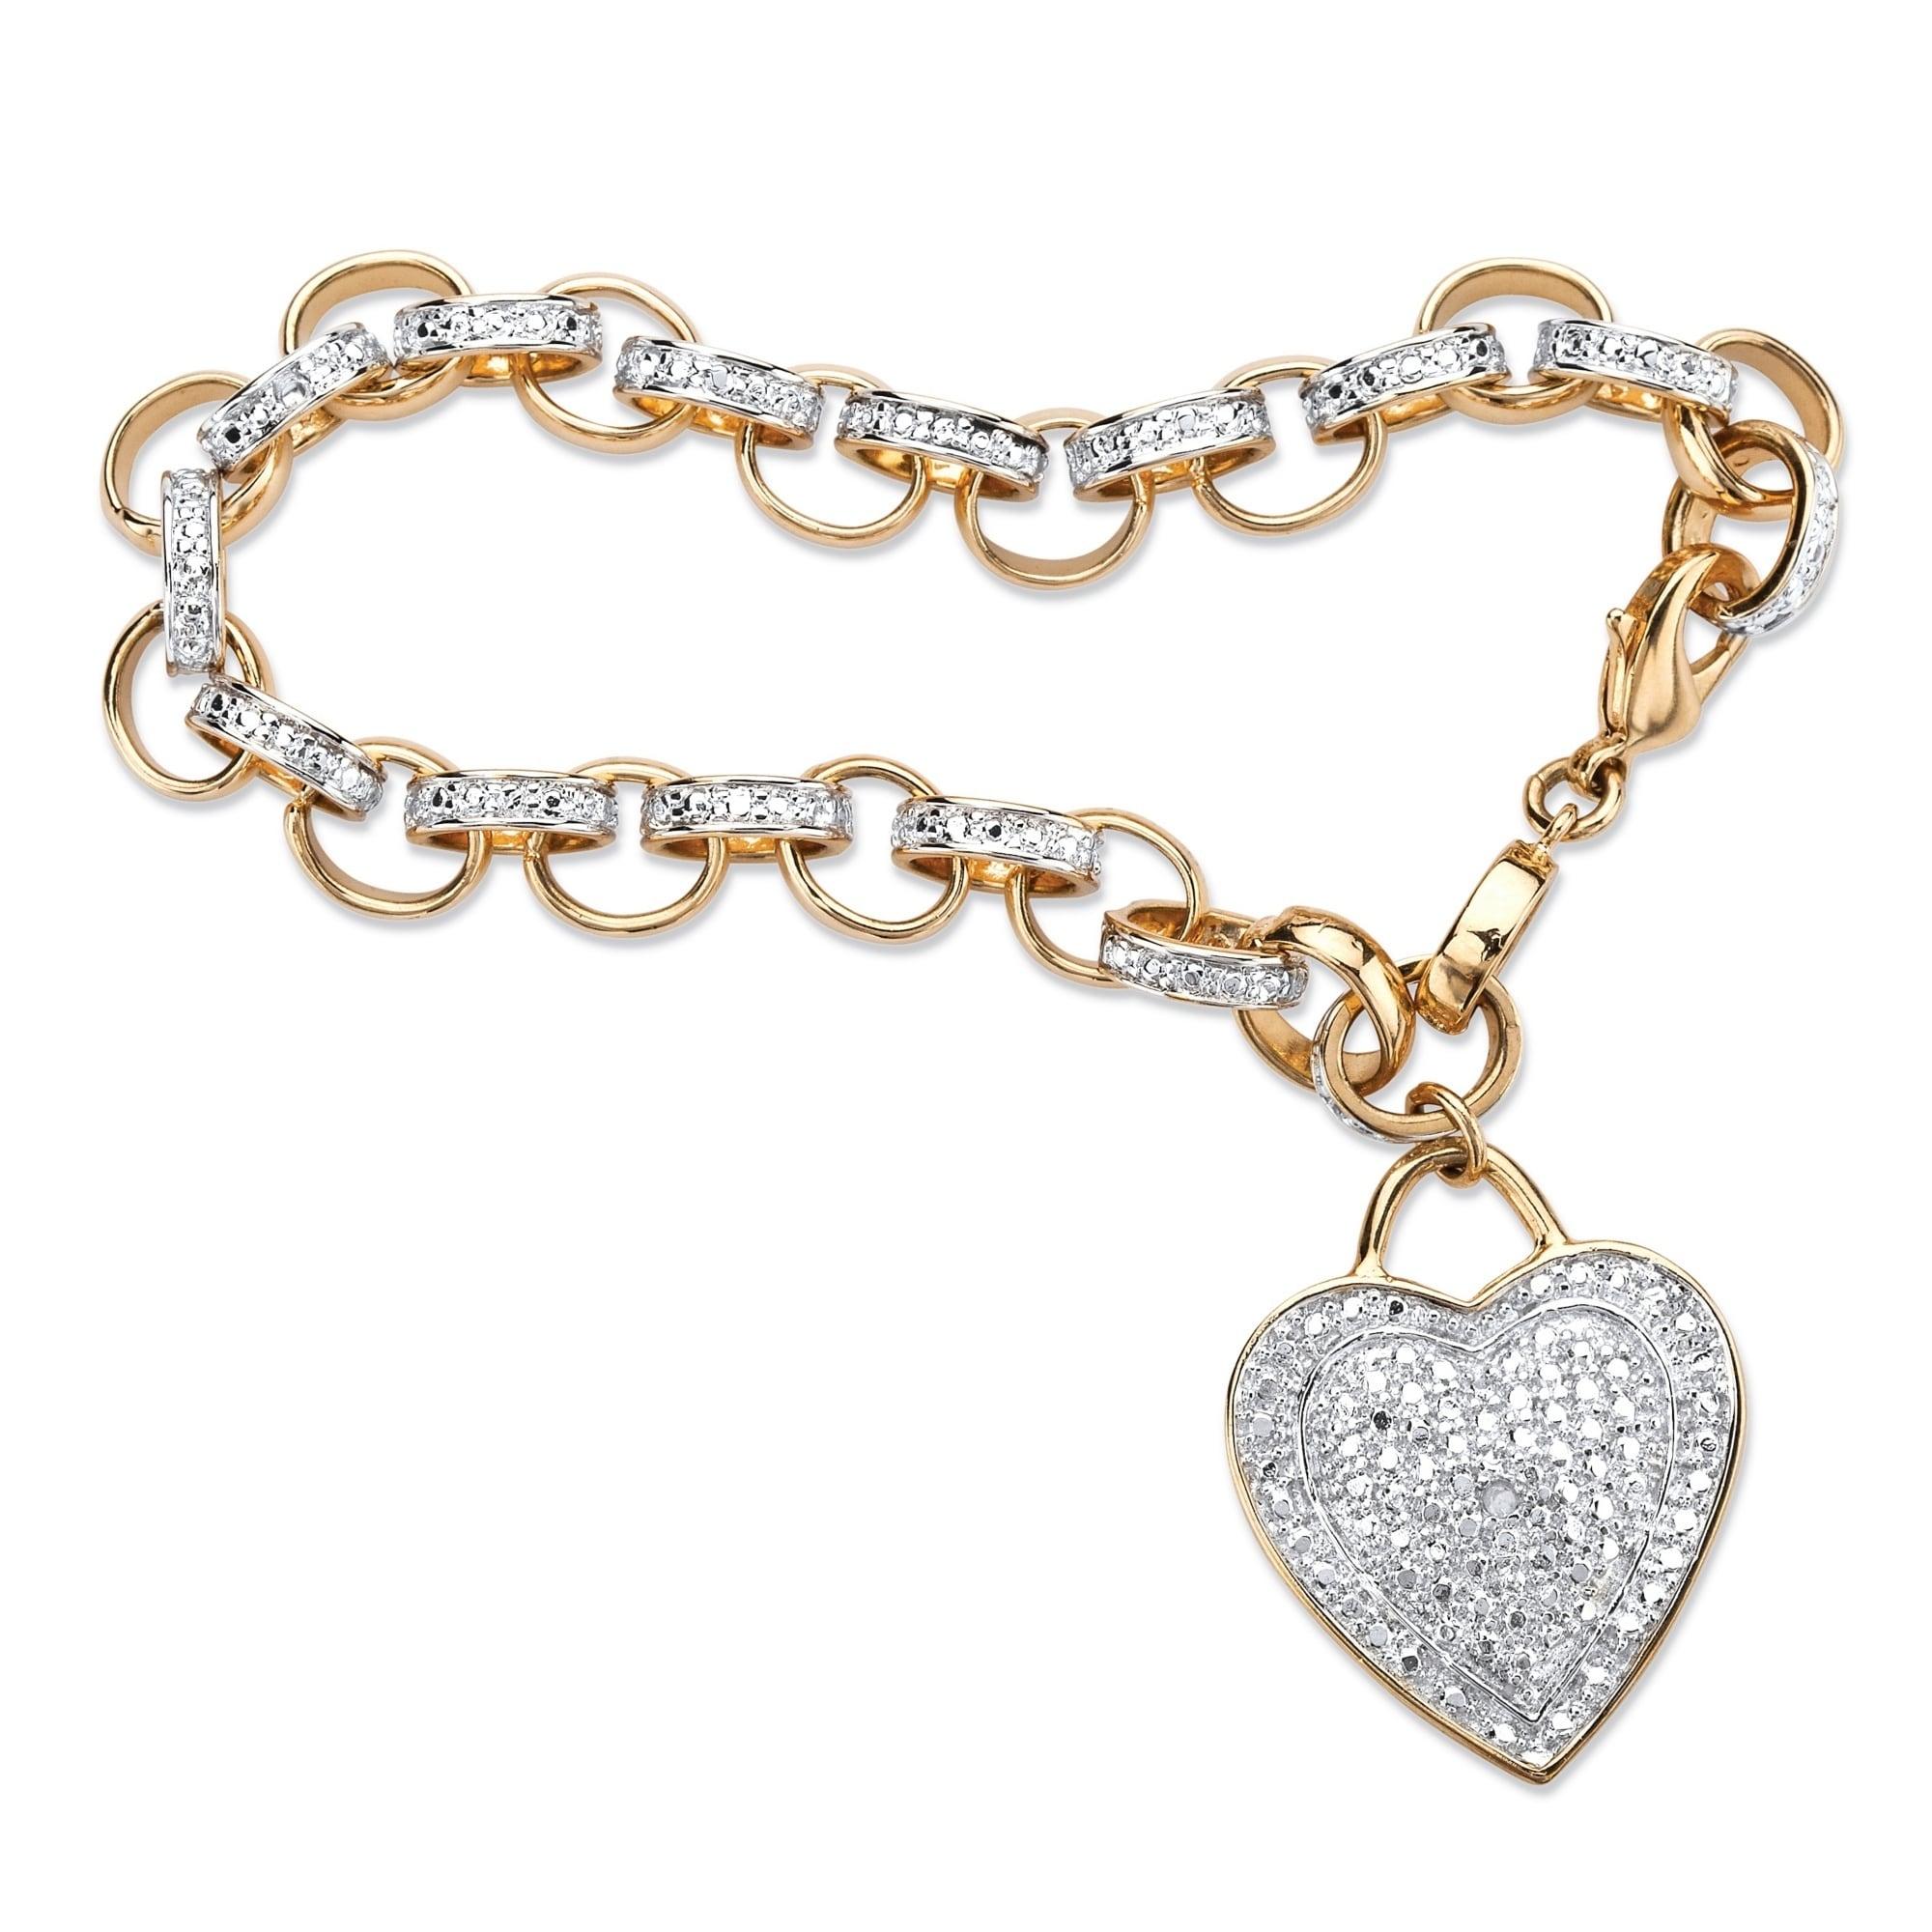 Palm Beach Yellow Gold-Plated Diamond Accent Heart Charm ...